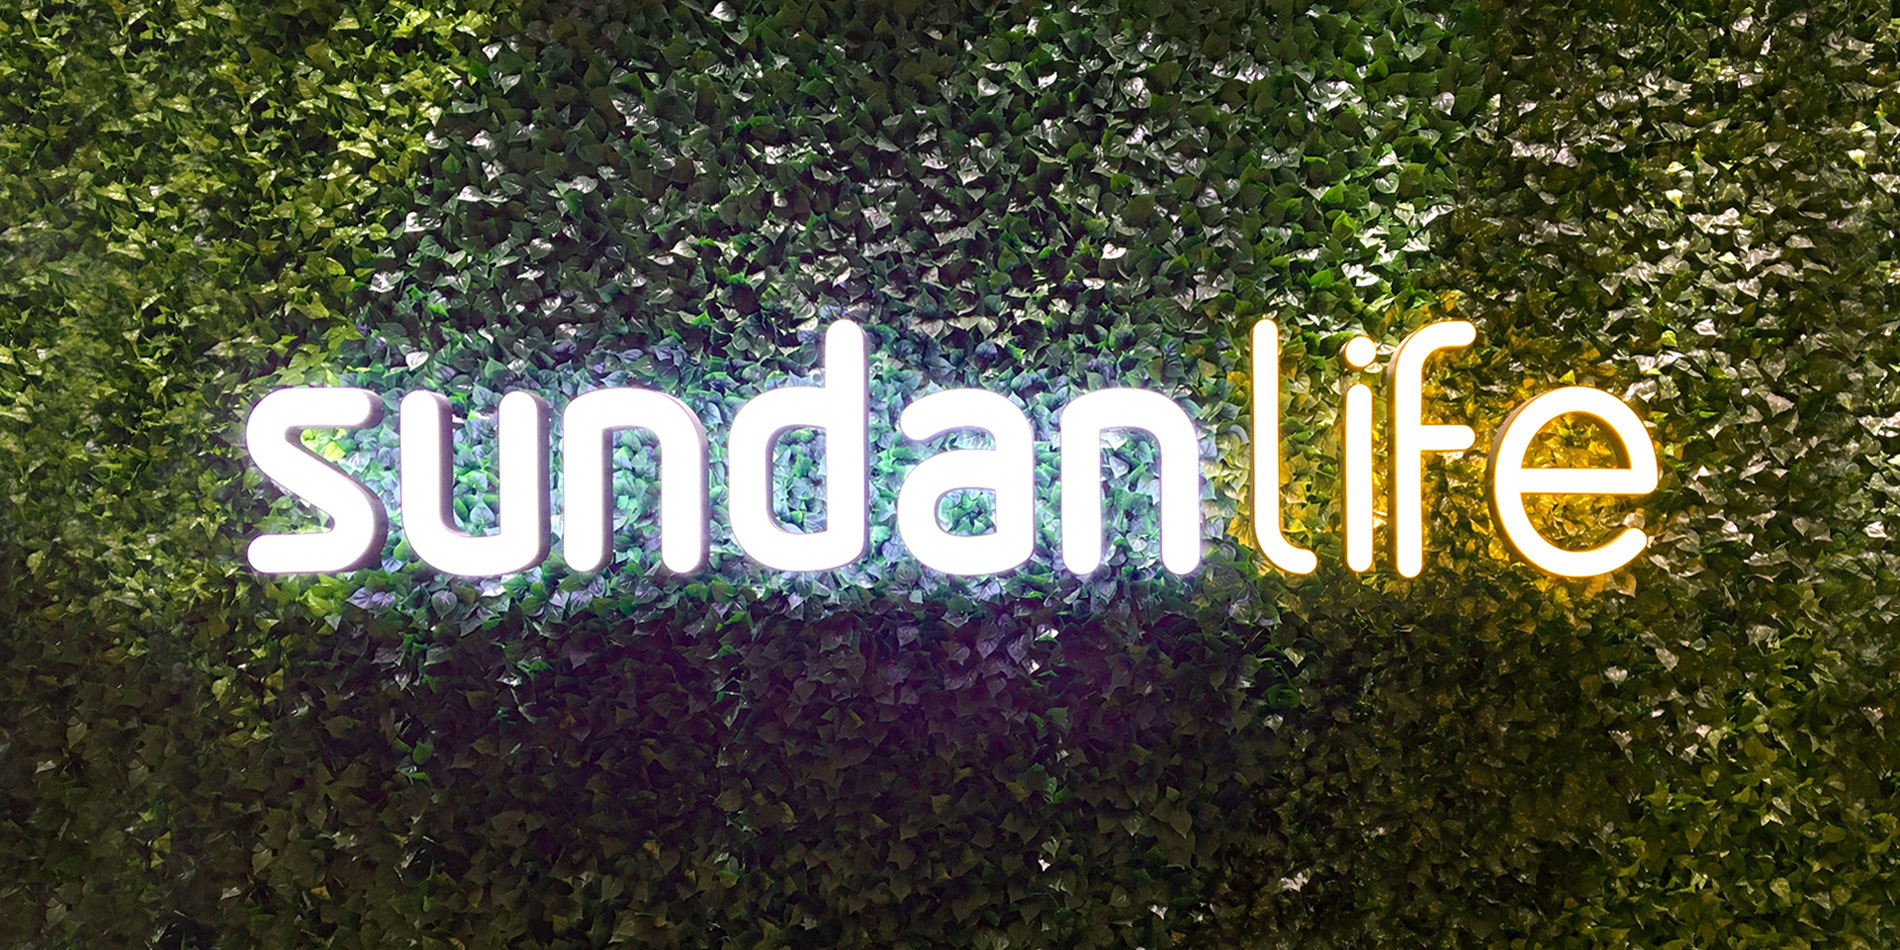 Sundan_life_018.jpg